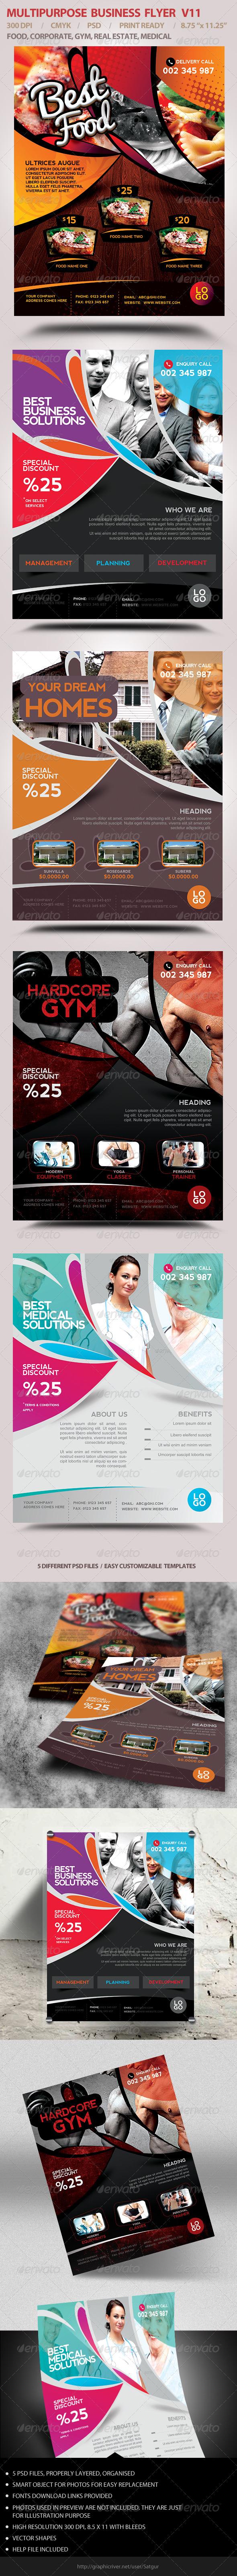 Multipurpose Business Flyer V11 - Flyers Print Templates